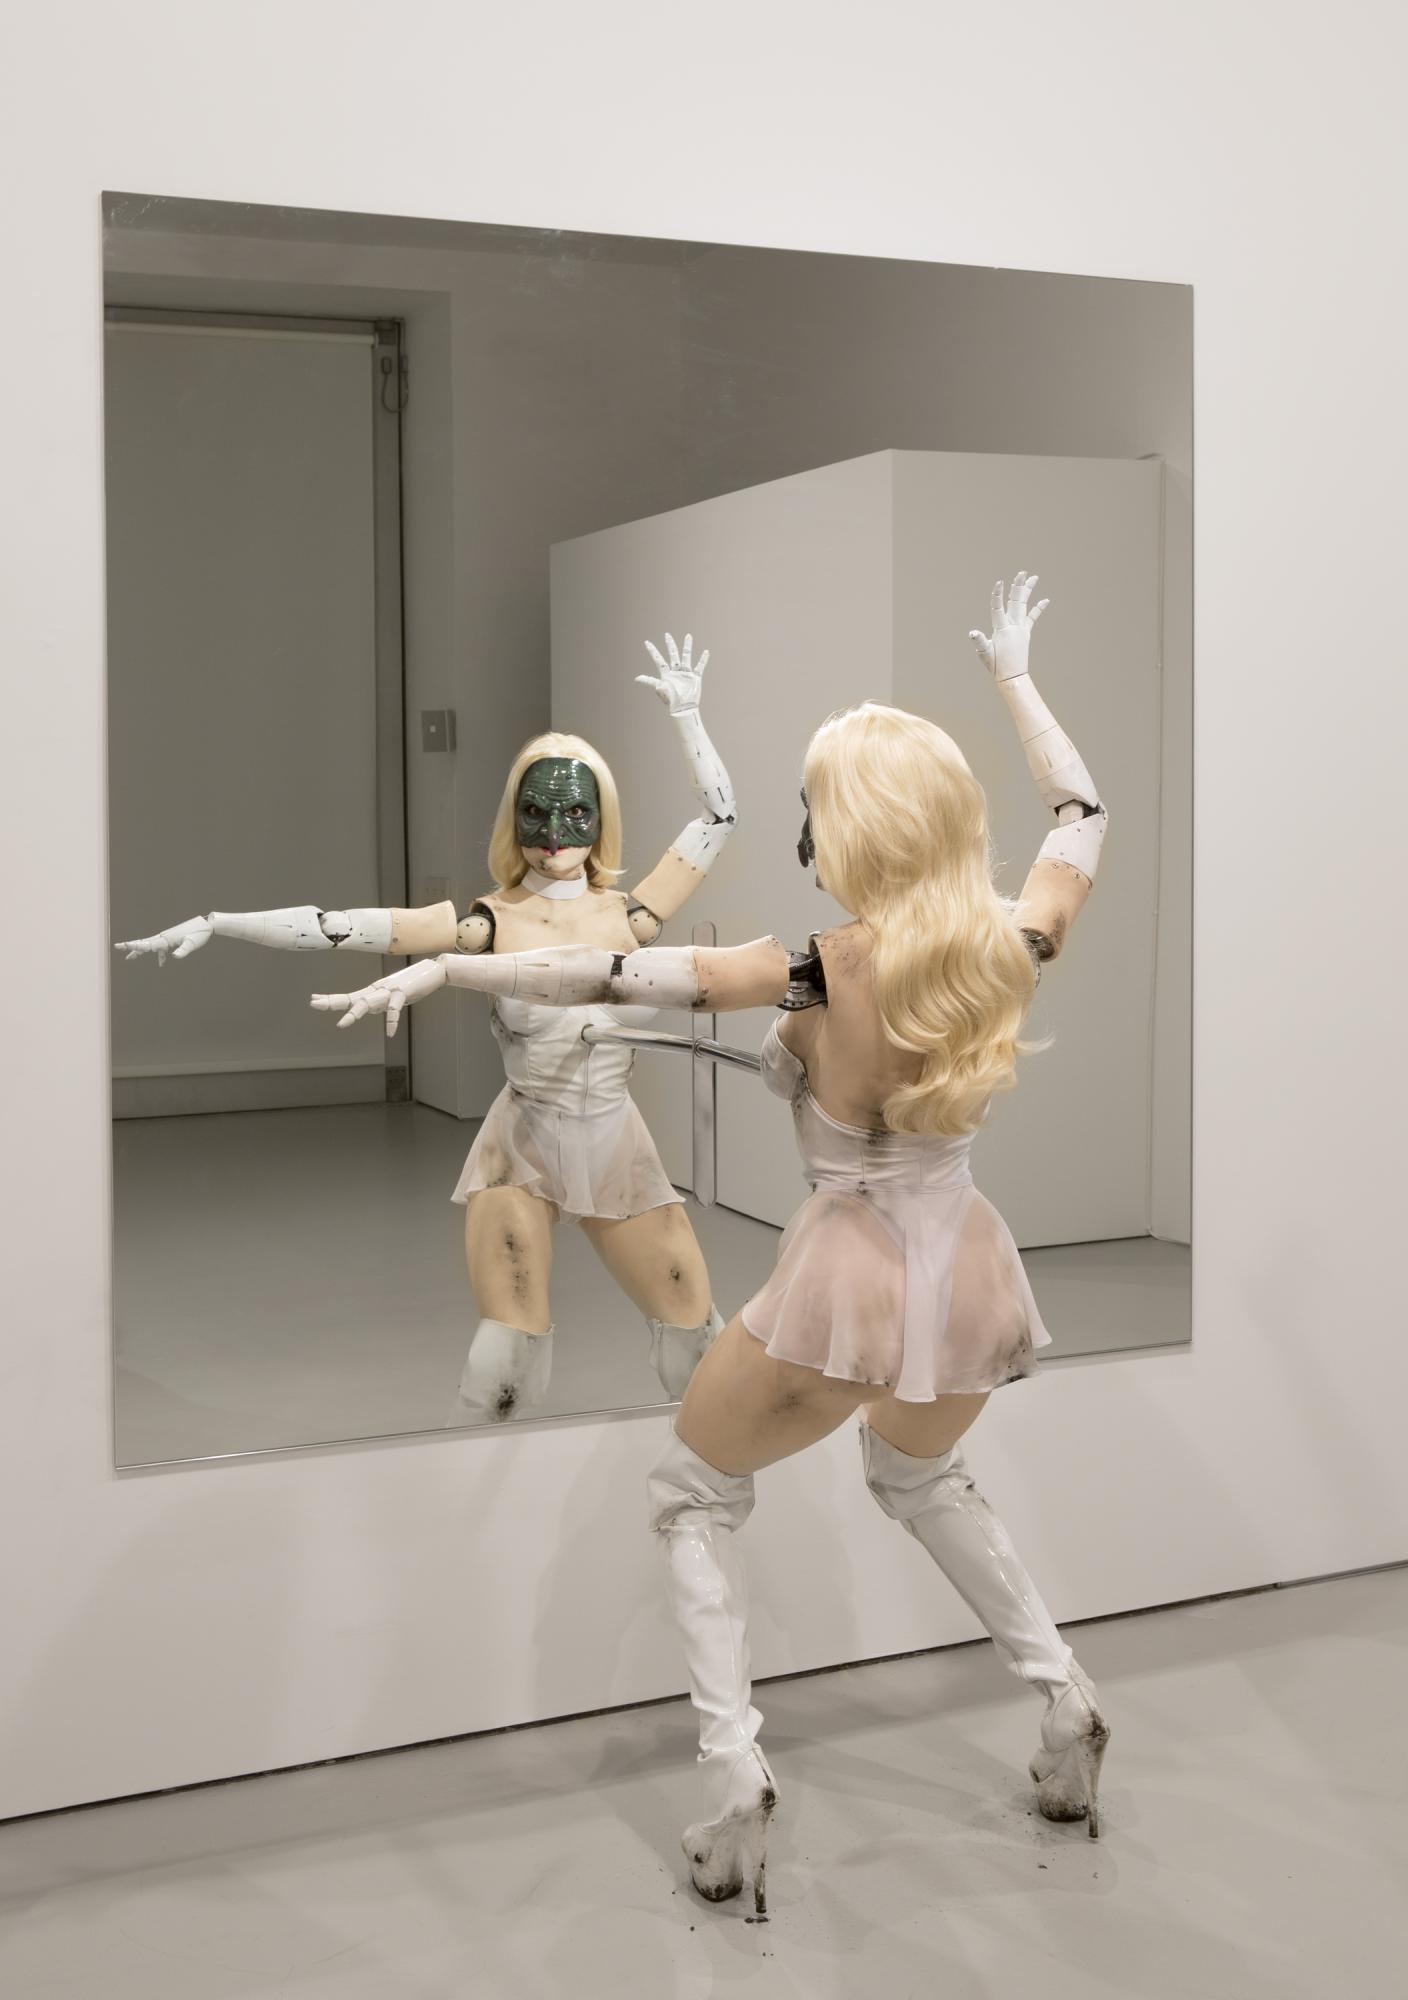 Hacer Larry Belmont adecuado  Jordan Wolfson's robot: In the Moment of Terror | Spike Art Magazine